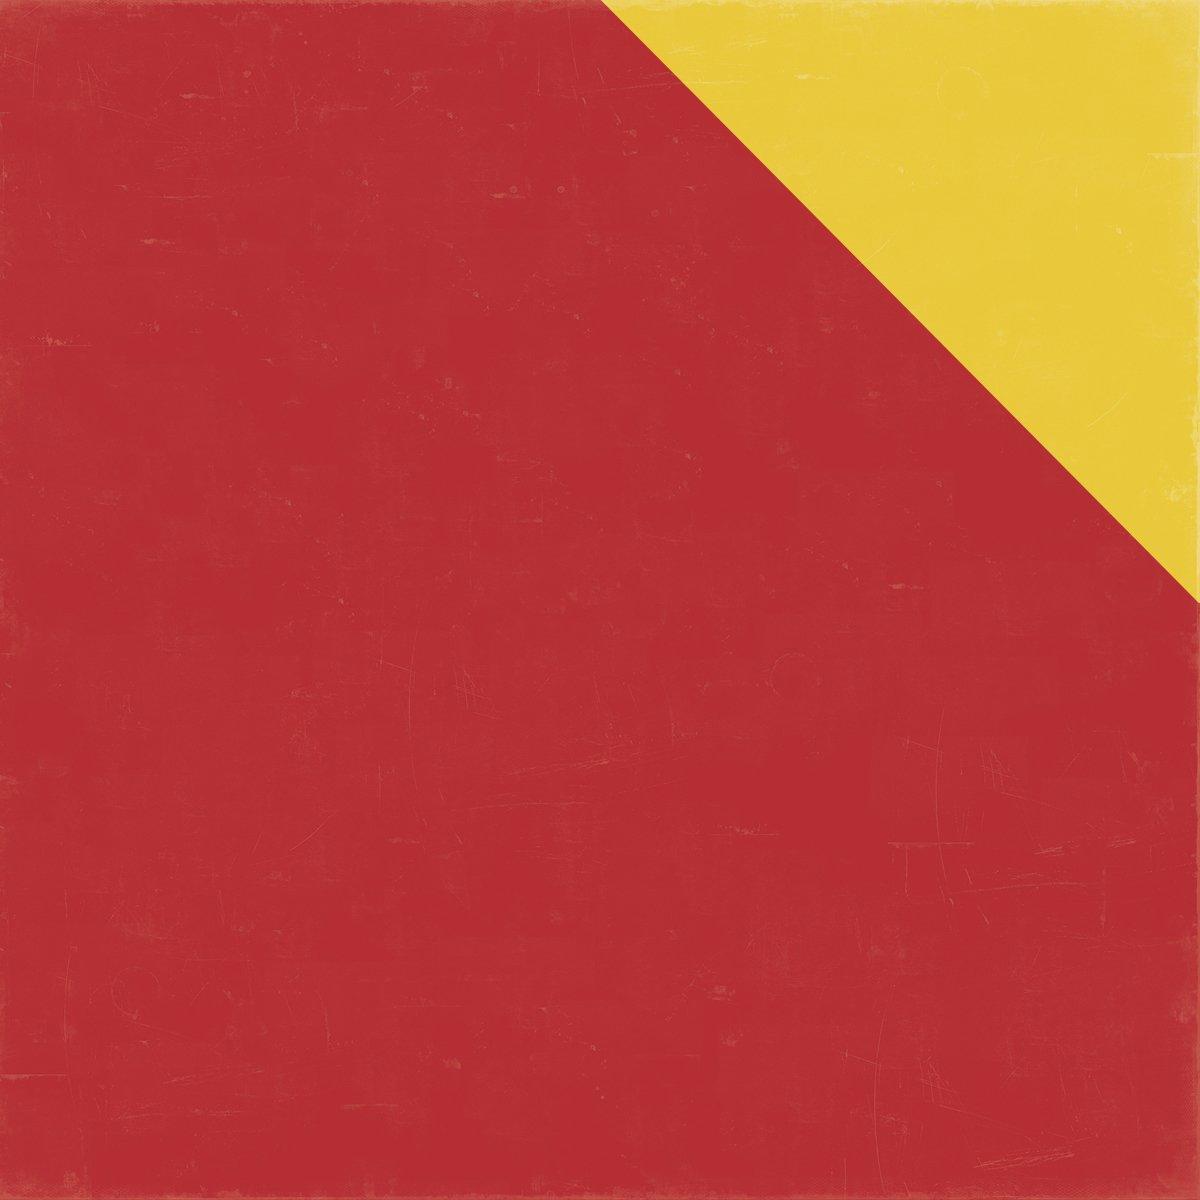 Echo Park Paper Bark massiv Distressed Karton 12 Zoll x 12 Zoll rot gelb, Acryl, Mehrfarbig B017GKAEL6 | New Products